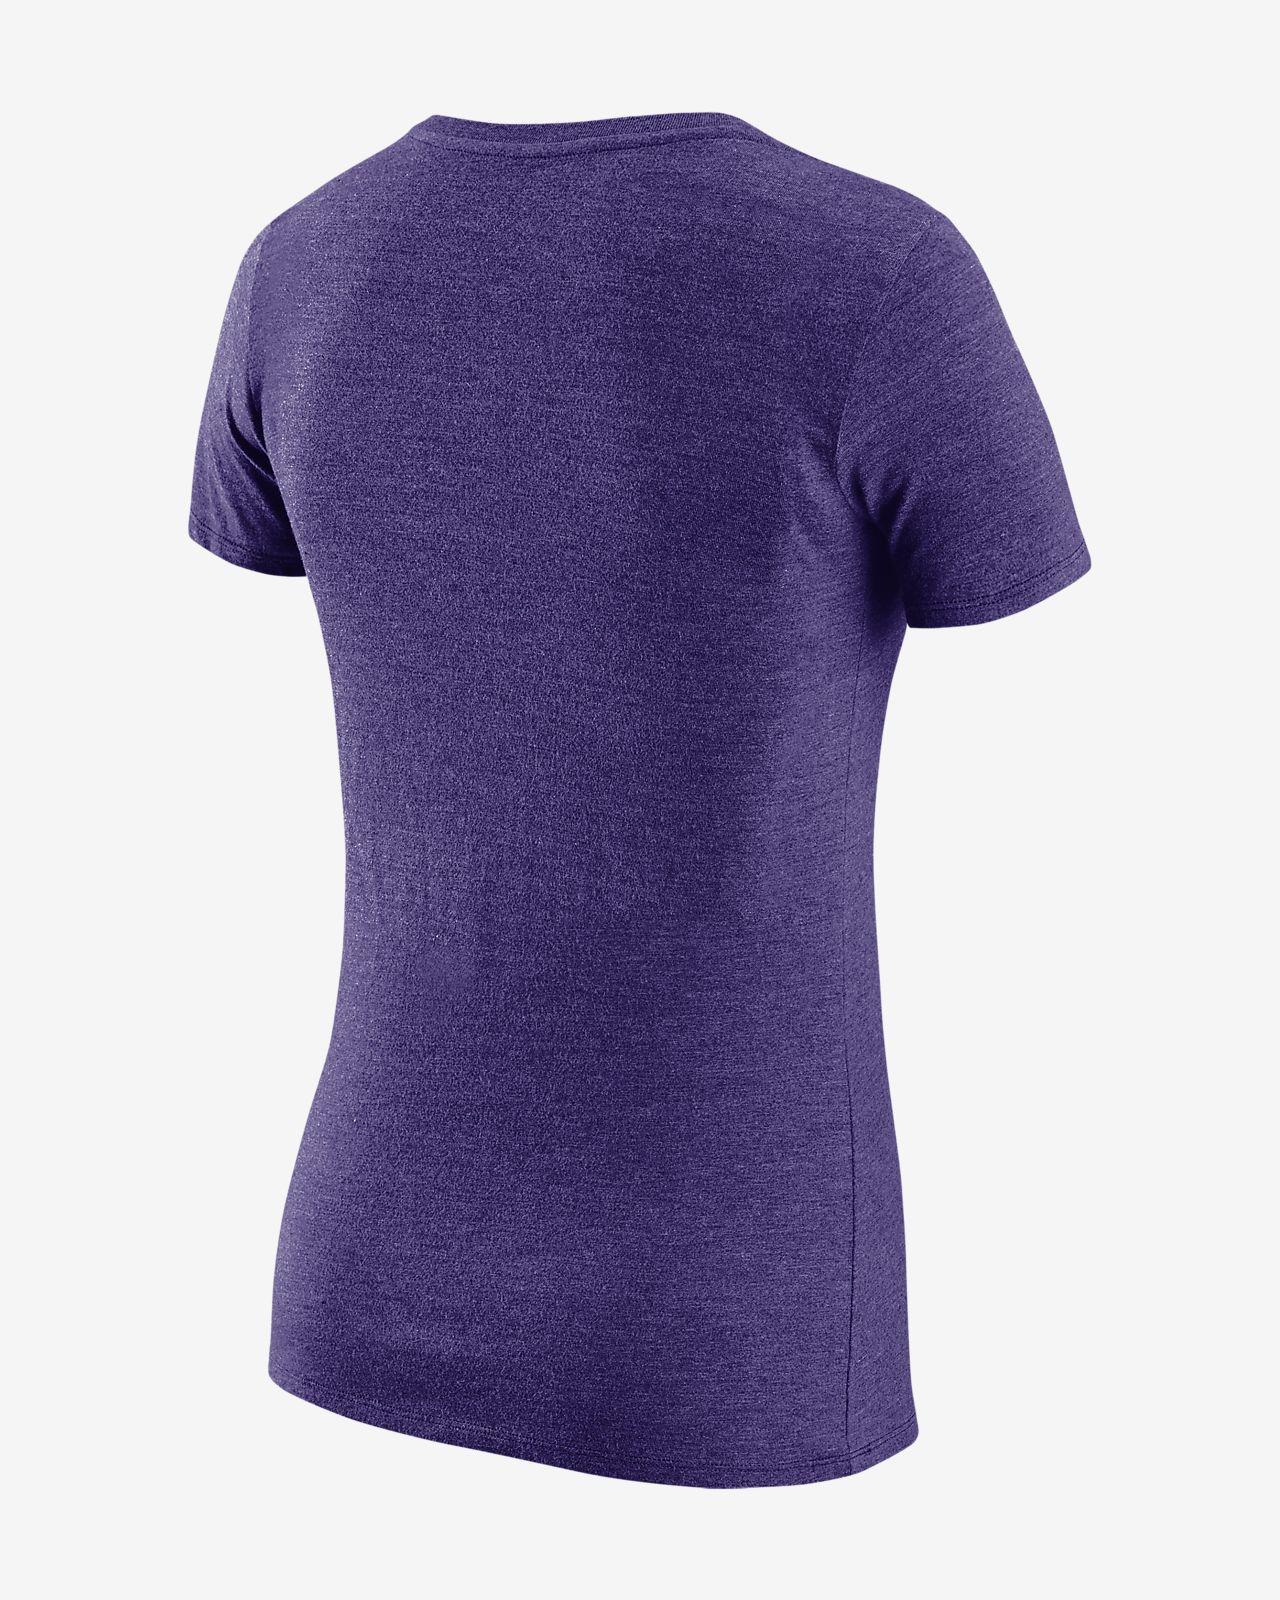 3b008d44 Los Angeles Lakers Nike Dri-FIT Women's NBA T-Shirt